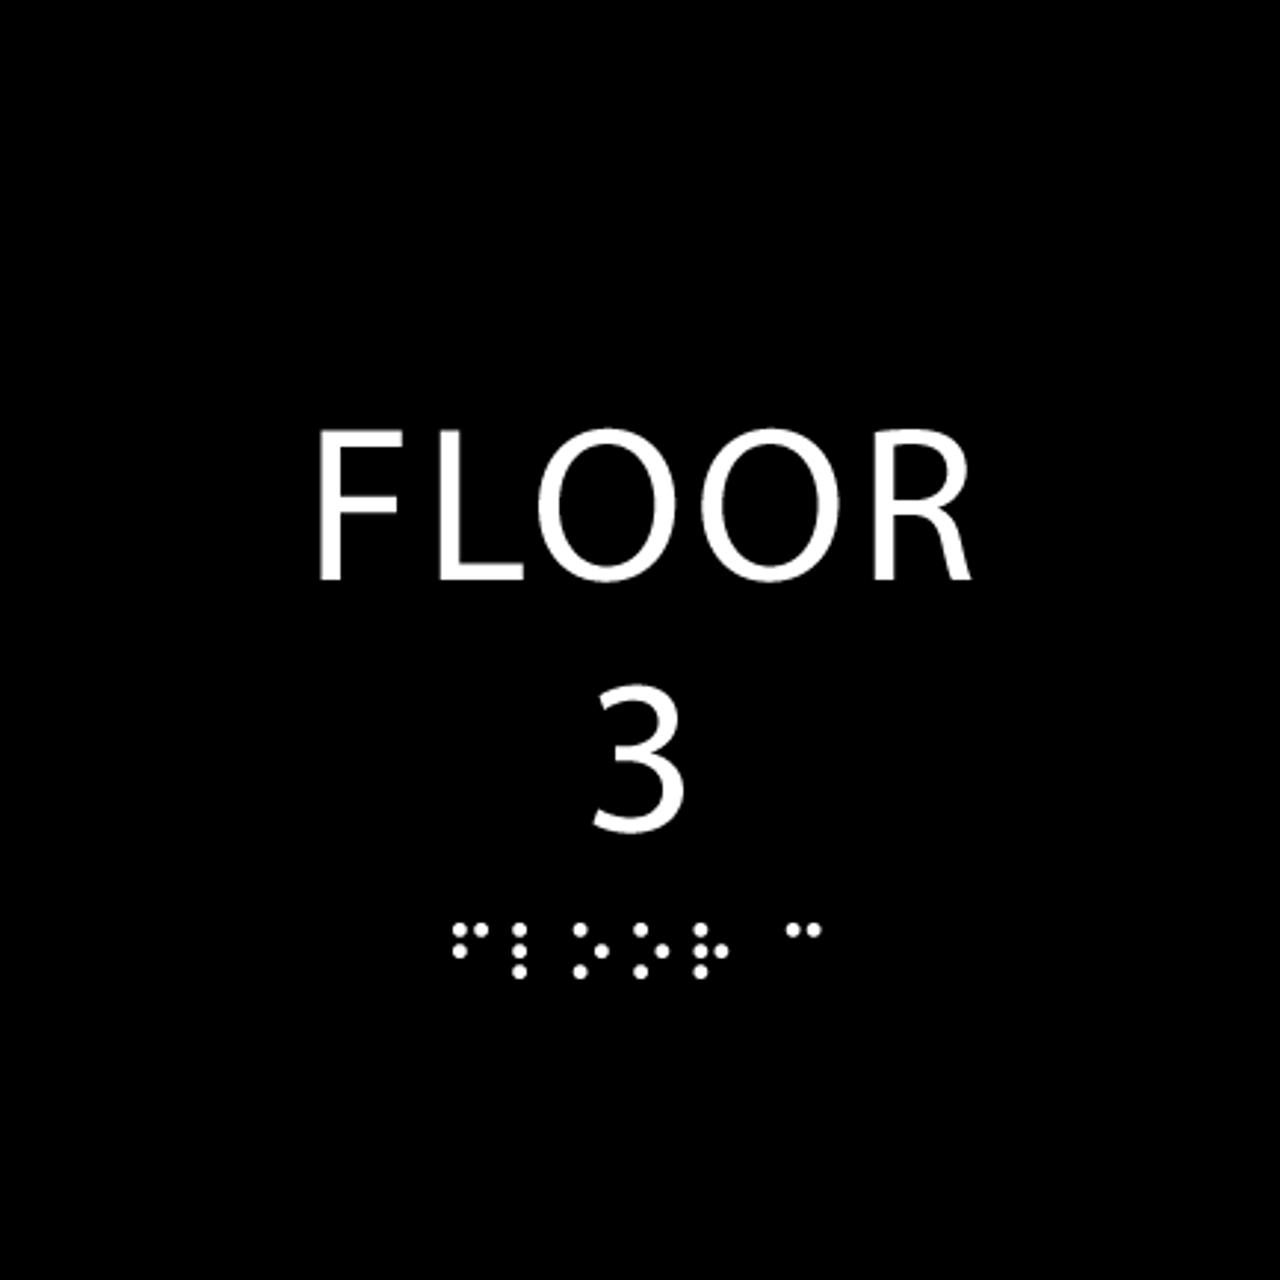 Black Floor 3 Identification Sign